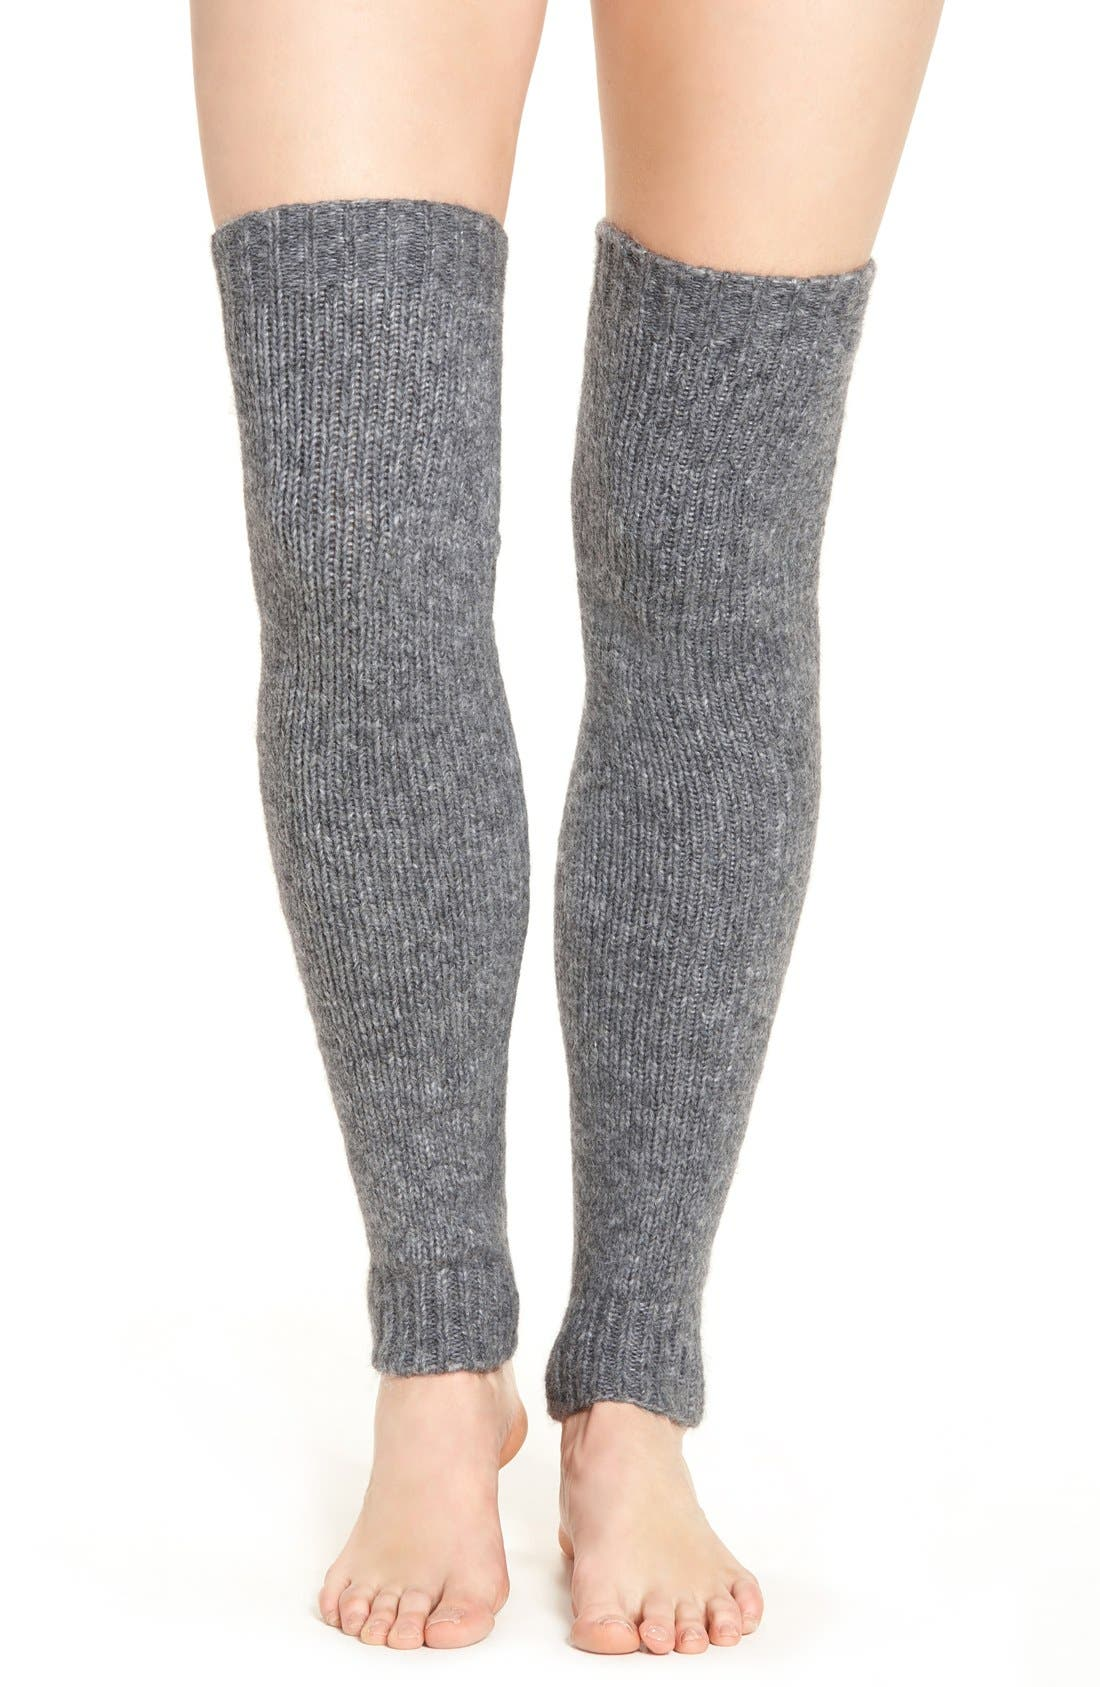 LEMON Powdered Wool Blend Leg Warmers, Main, color, 069